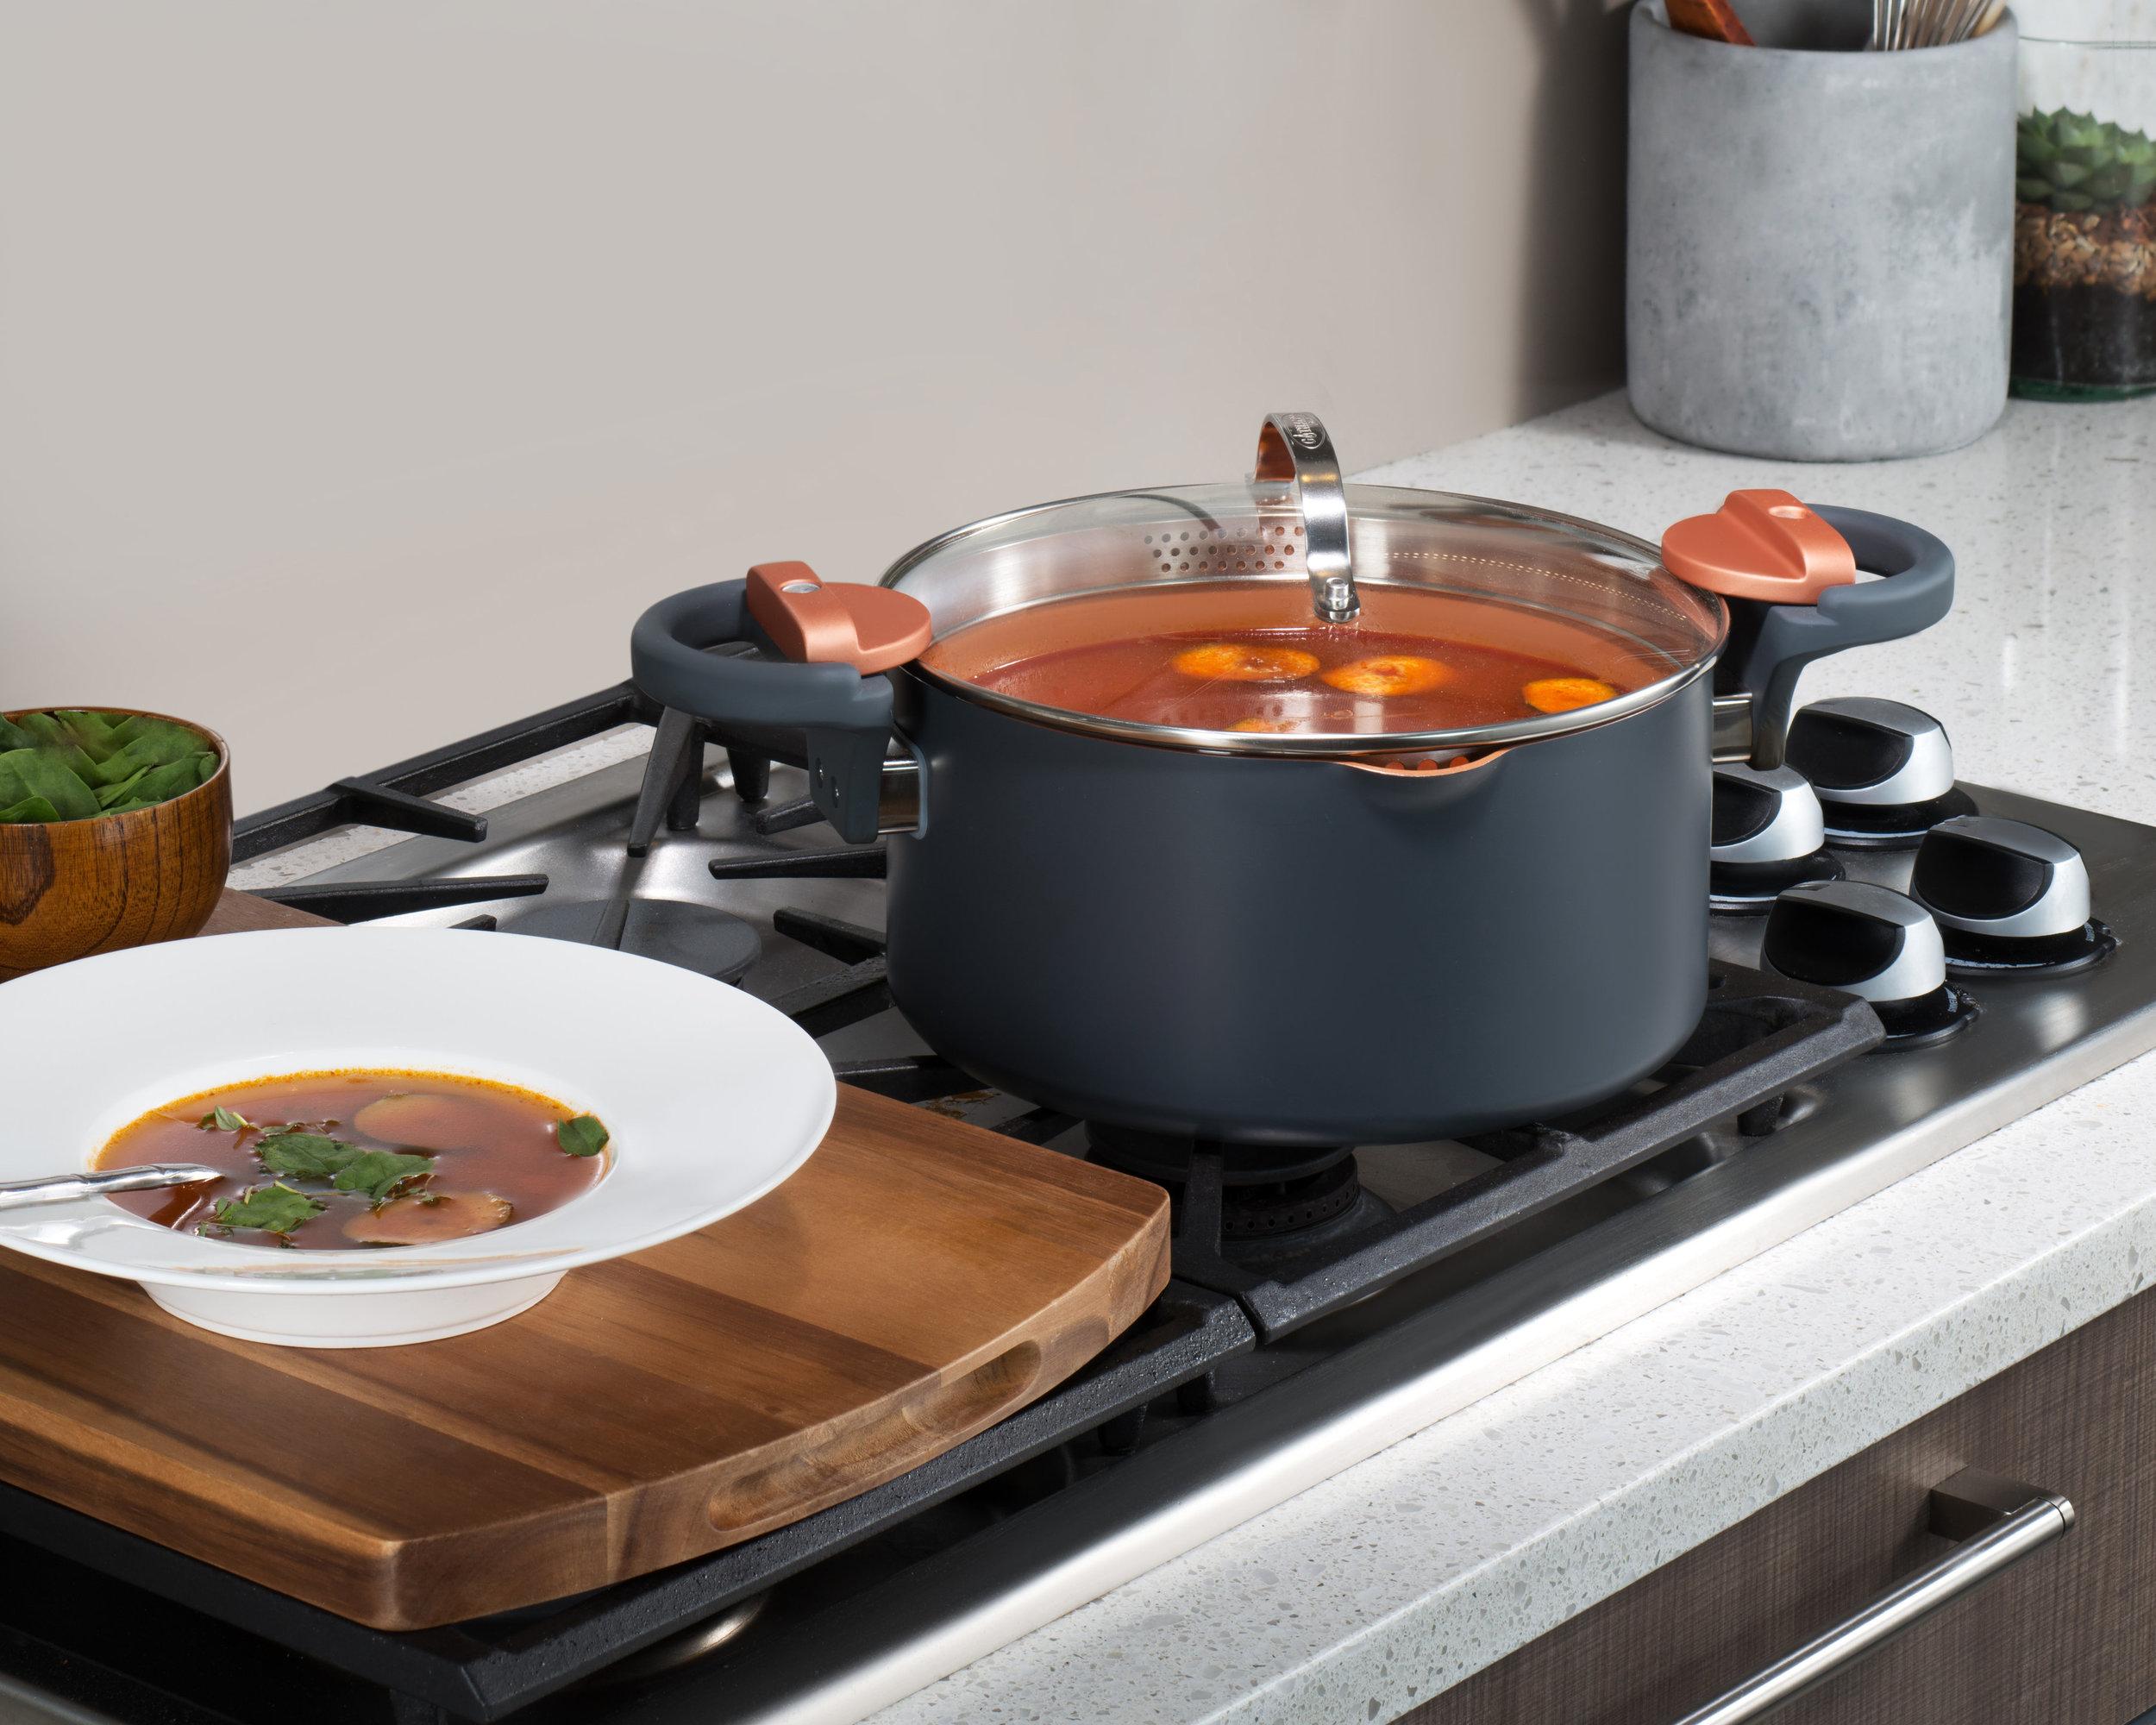 Pasta Pot with Soup.jpg